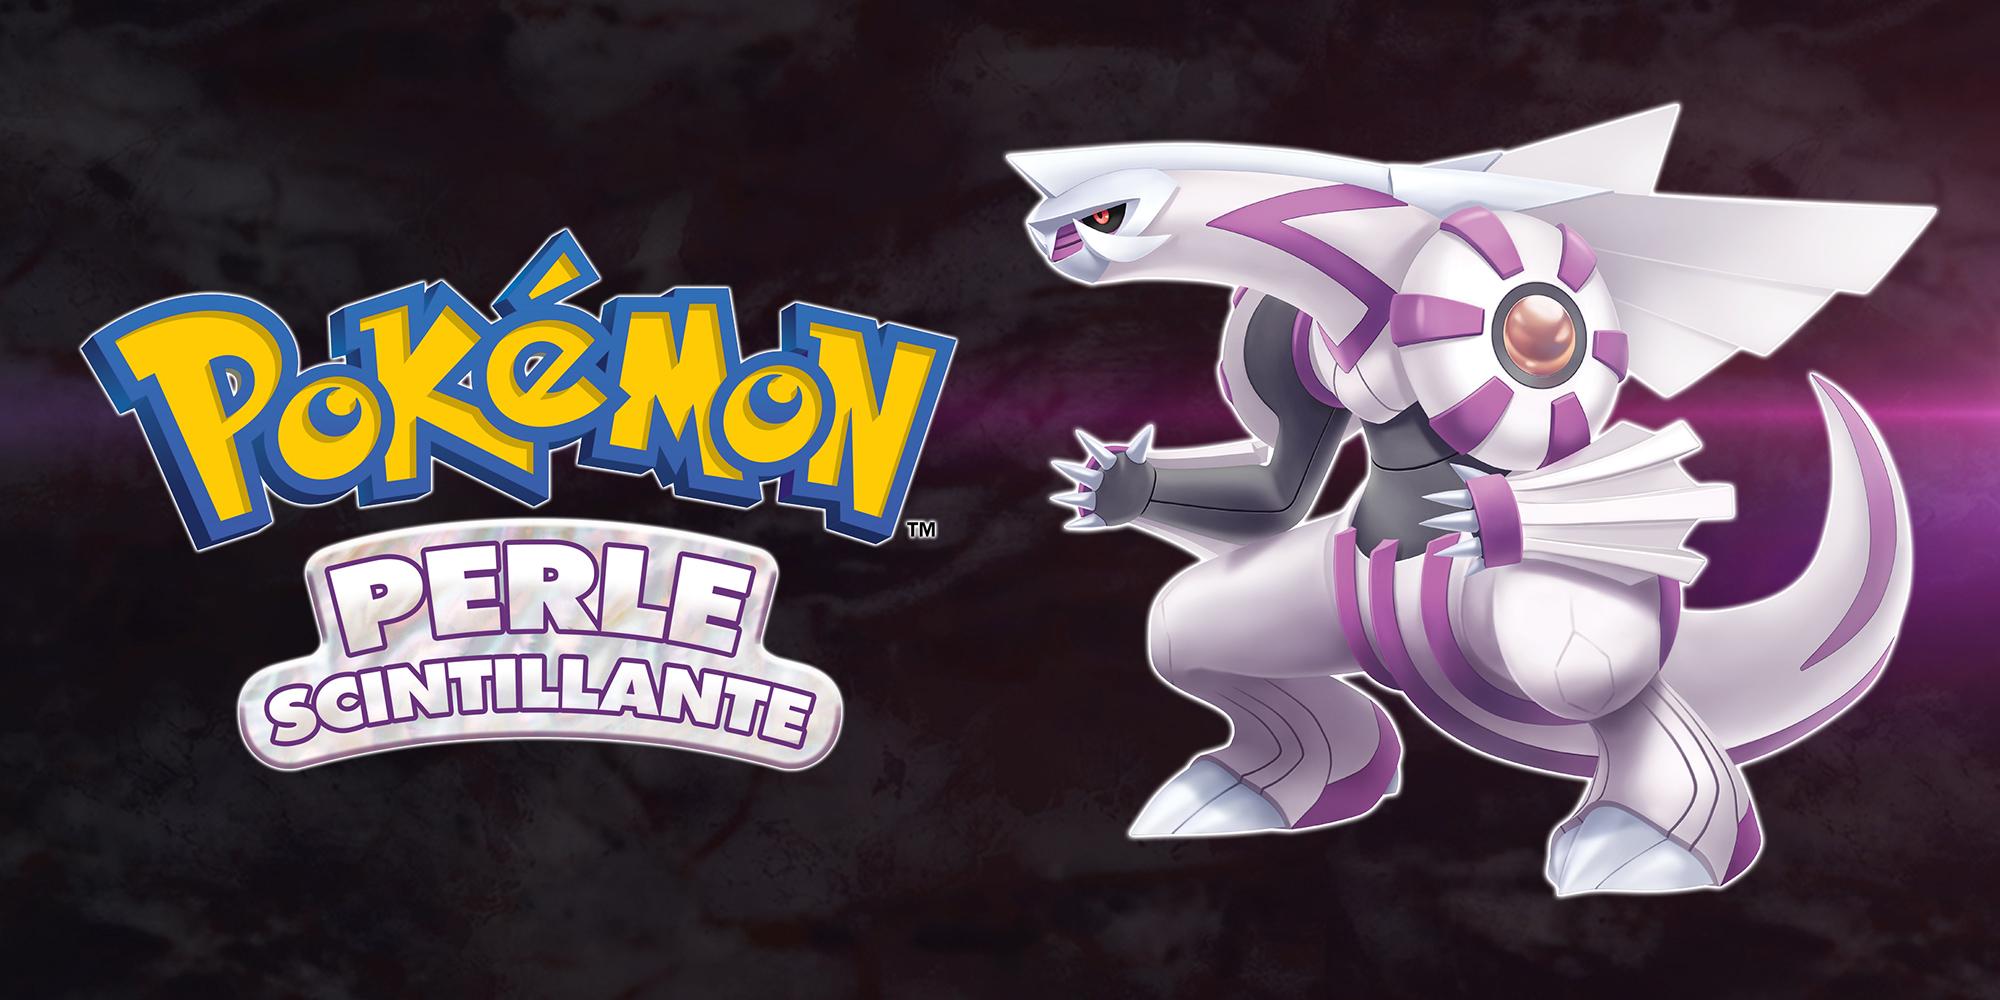 Pokémon Perle Scintillante sur jdrpg.fr